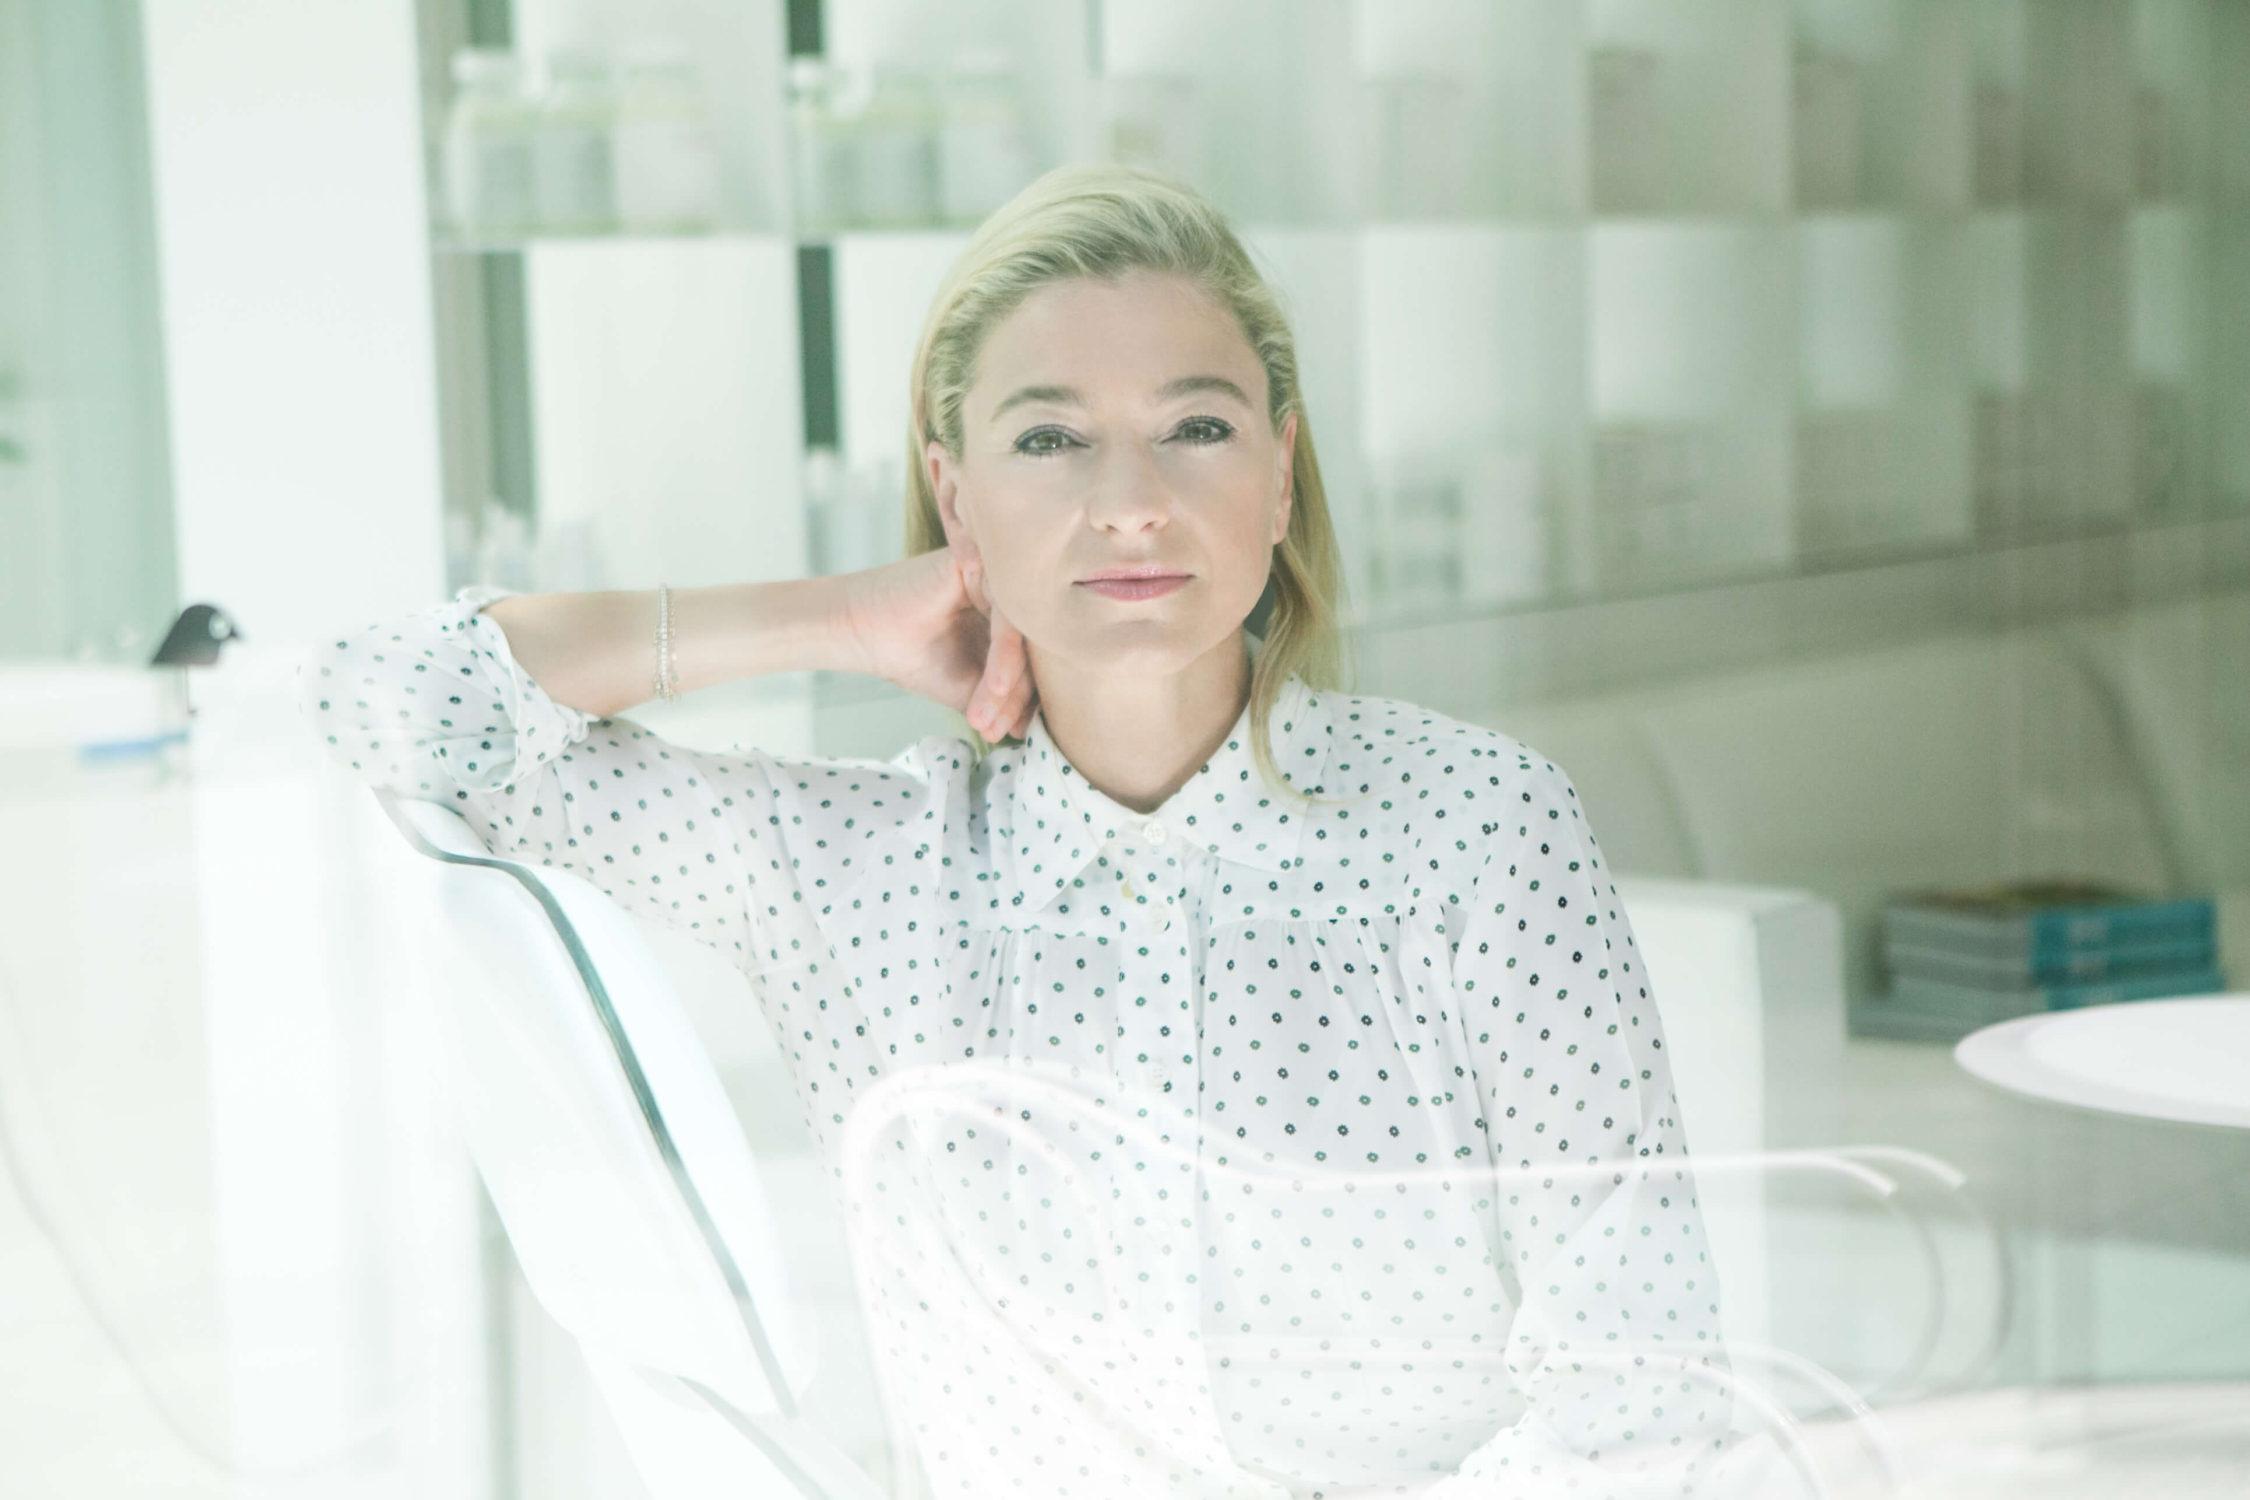 Semaine tastemaker Susanne Kaufmann by Giada Mariani